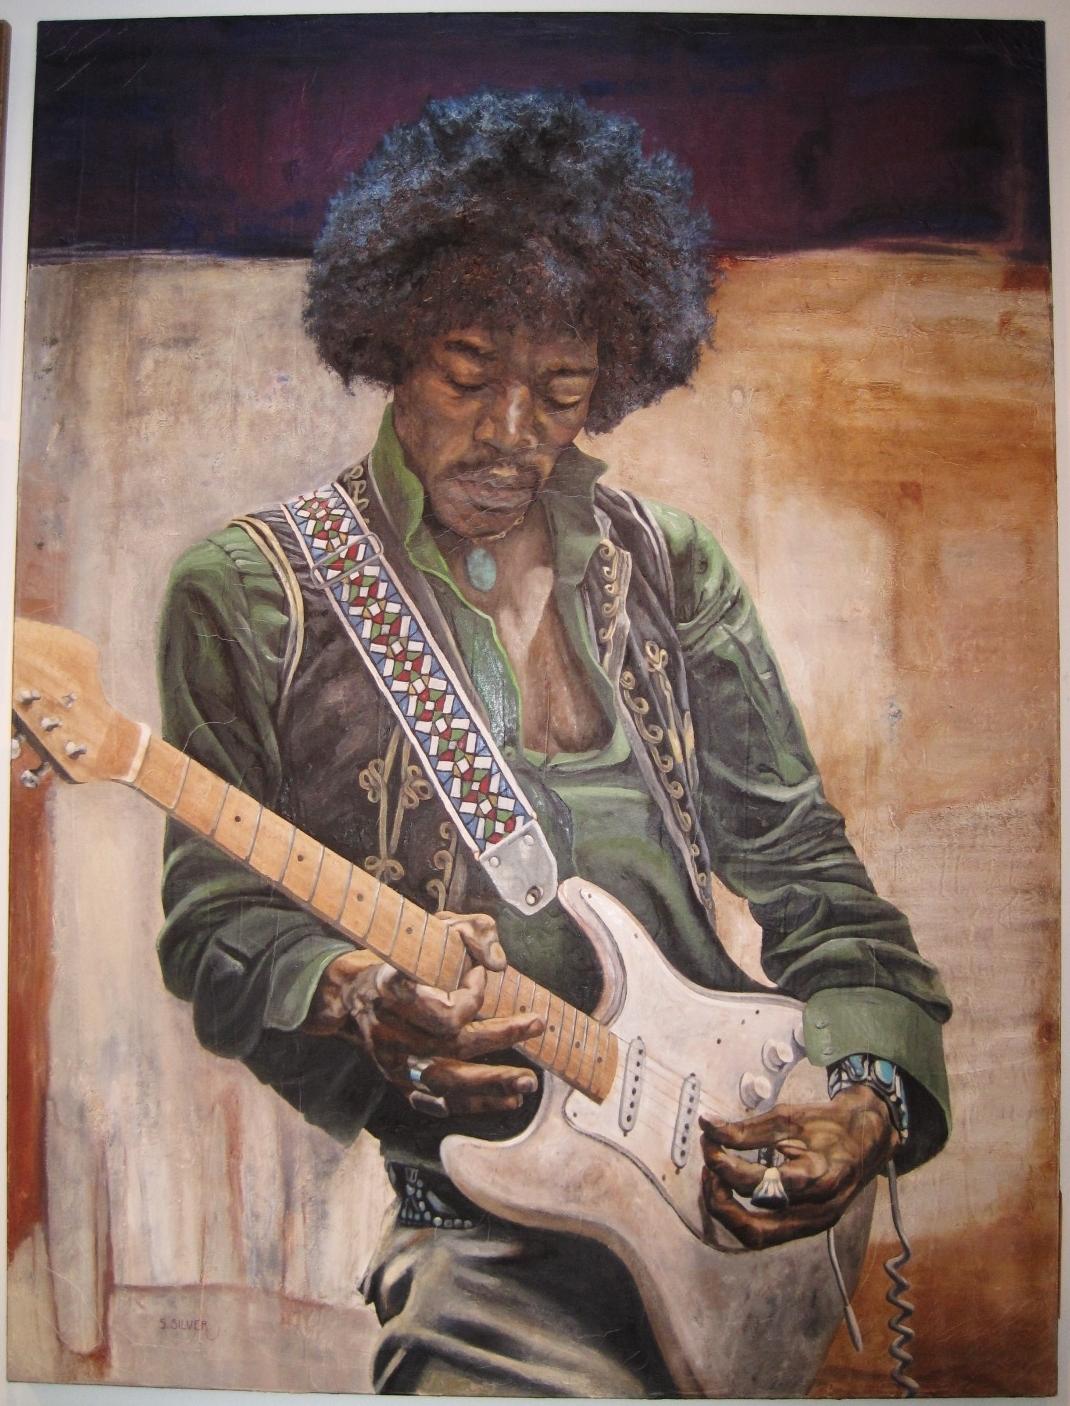 jimi hendrix paintings guitar art stratocaster guitar culture jimi hendrix painting by stanley silver